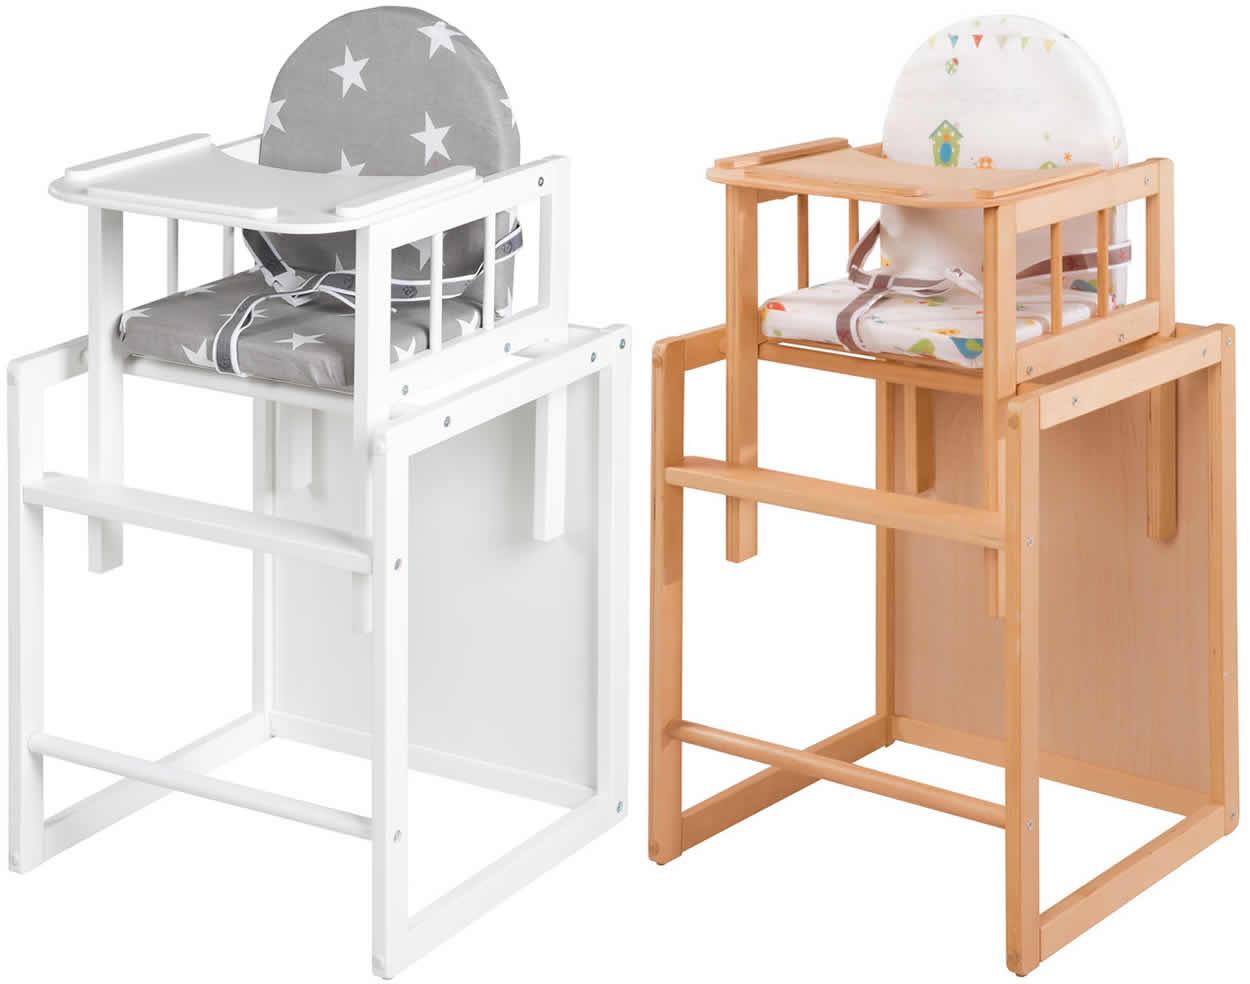 roba kombihochstuhl hochstuhl kinderhochstuhl holz ebay. Black Bedroom Furniture Sets. Home Design Ideas